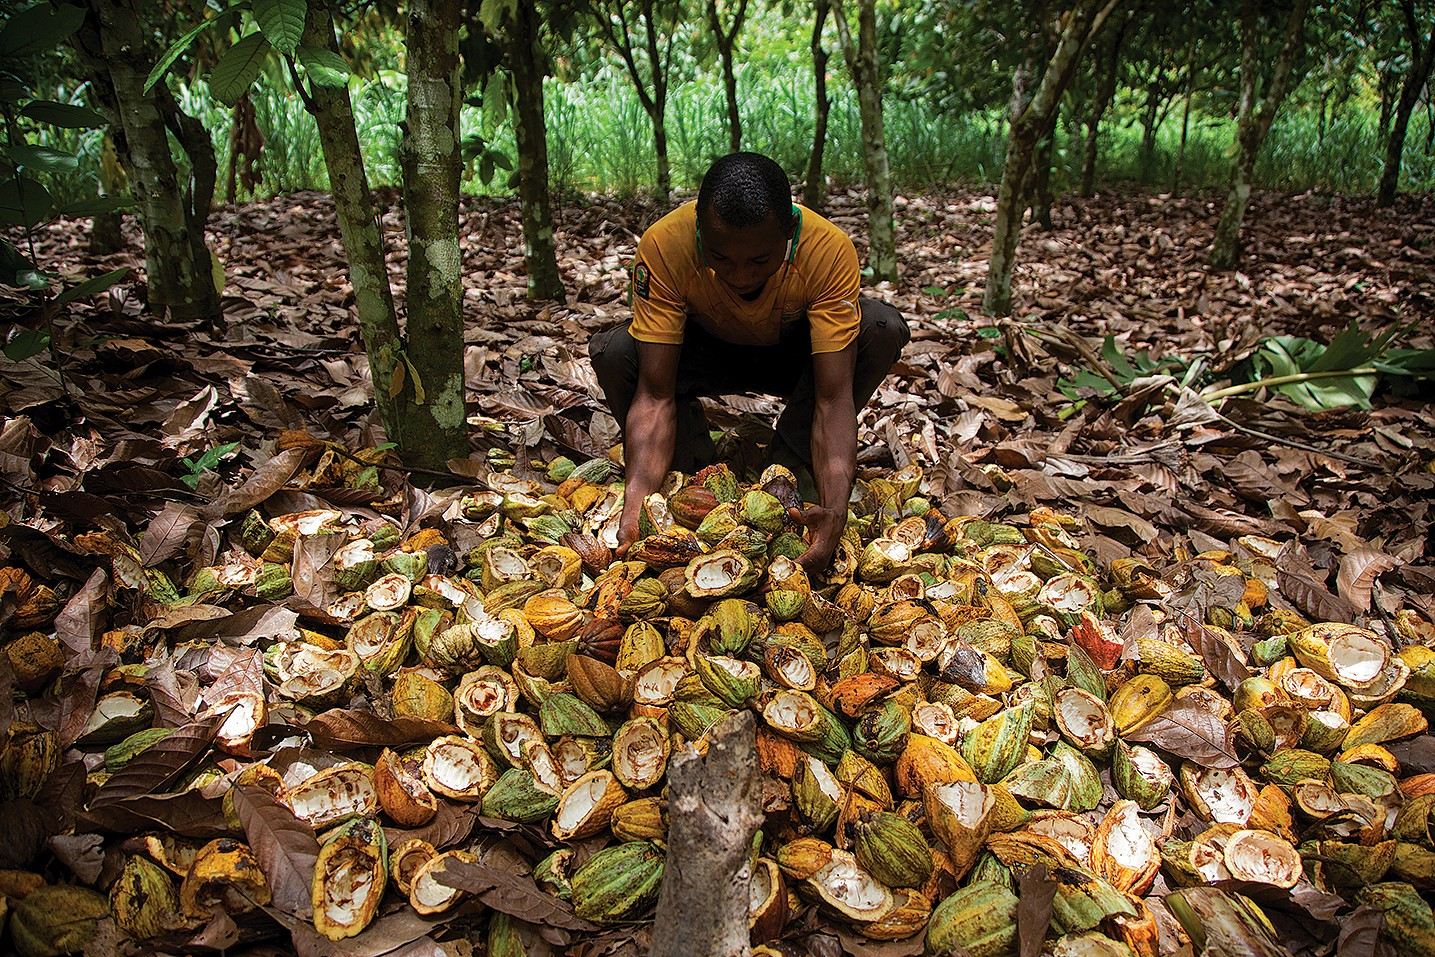 Fairtrade does not walk the talk